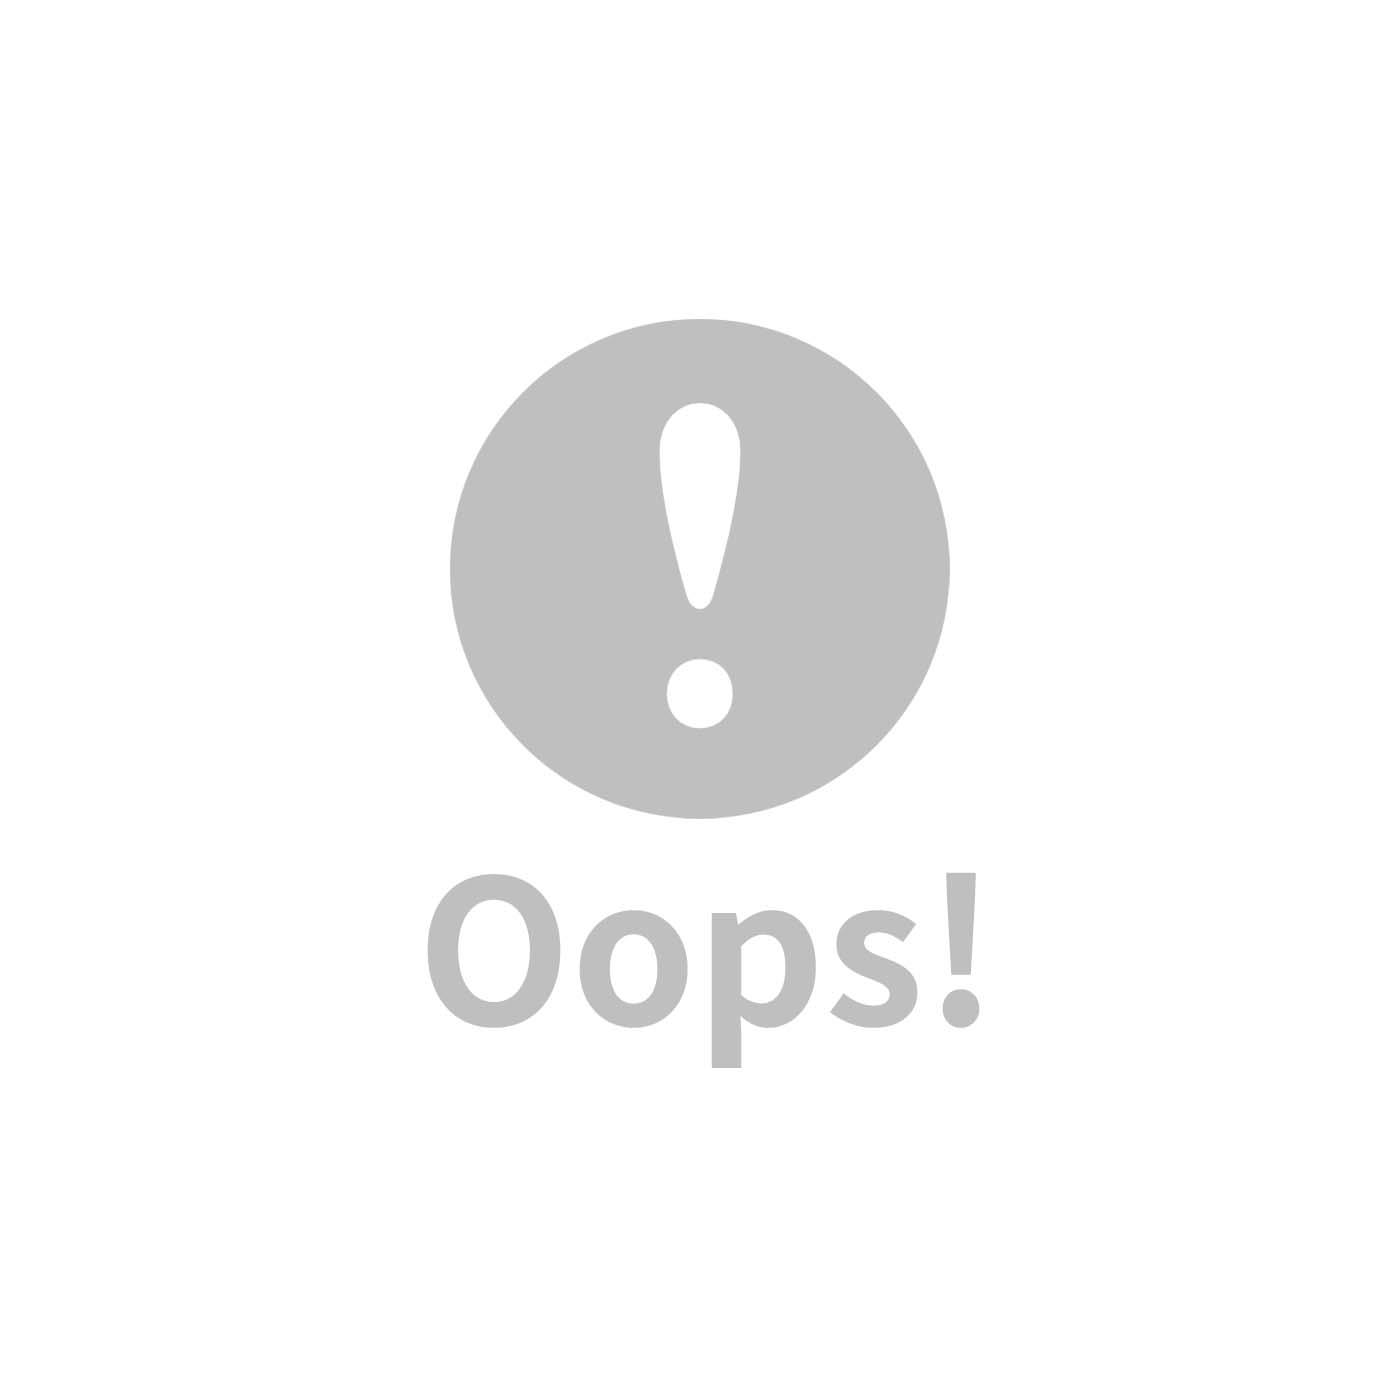 La Millou Moonies頂級羊皮膠底學步鞋禮盒11-18m_魔鬼氈款(薄荷)